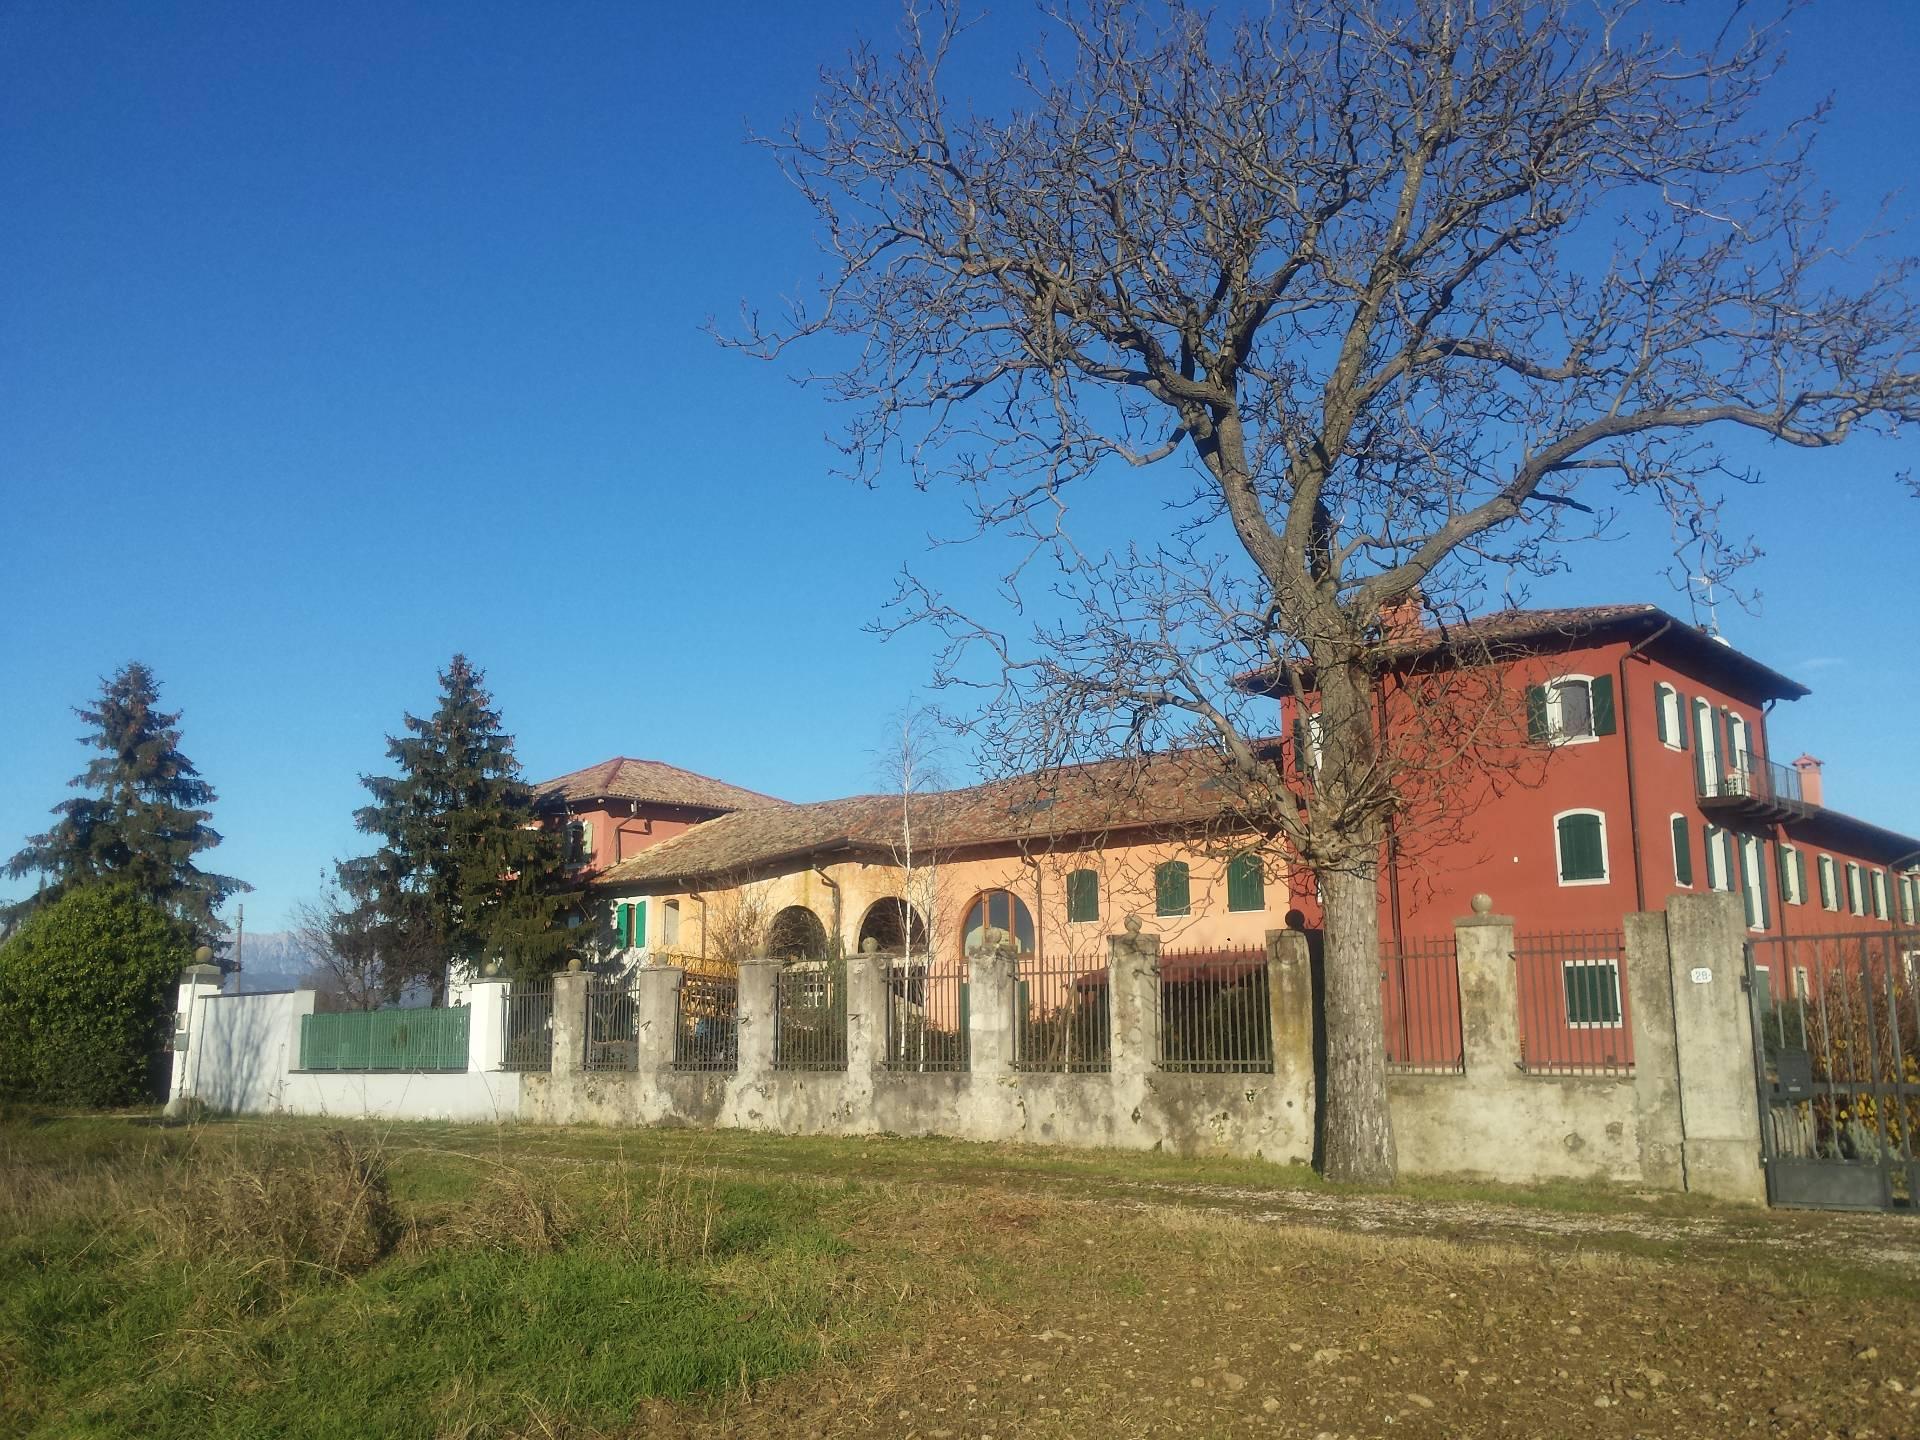 Giardino In Città Udine rustico a udine - beivars cod. pq9155